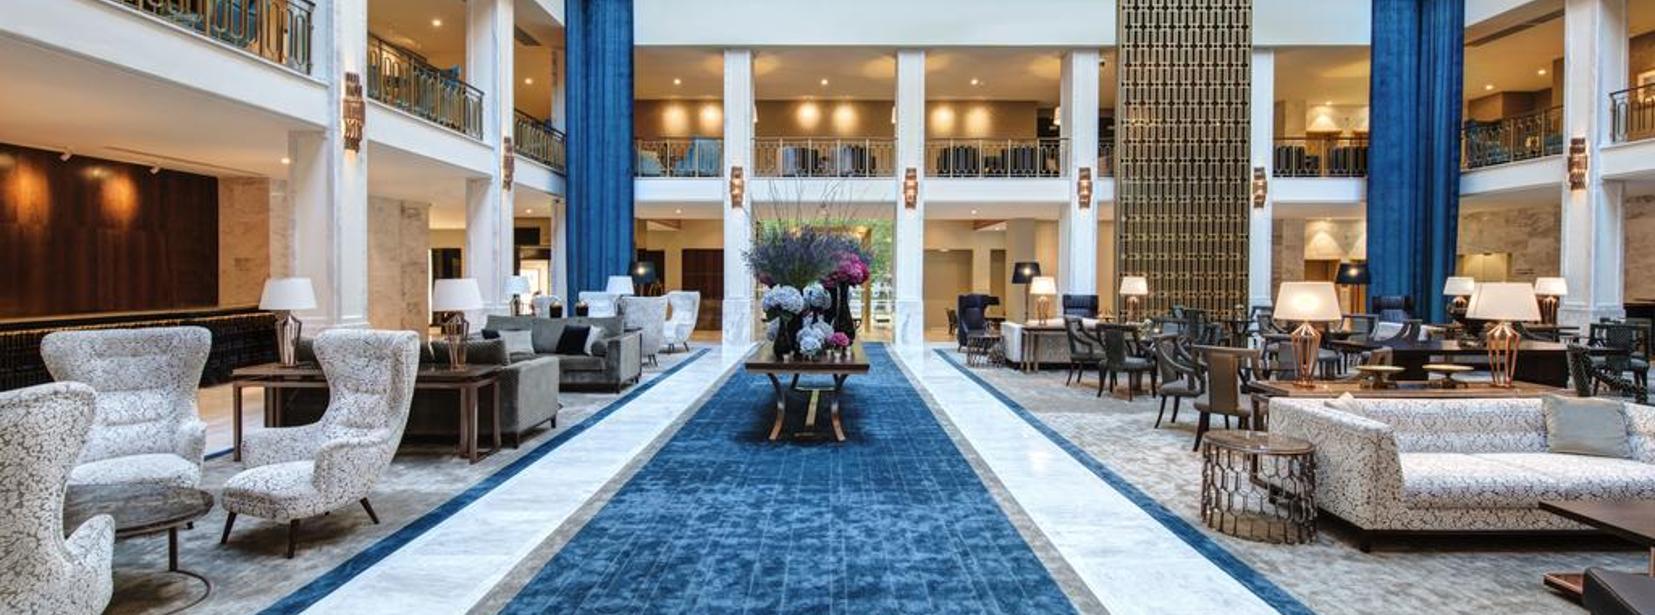 Tivoli Hotel Lisboa Lissabon Mycityhighlight